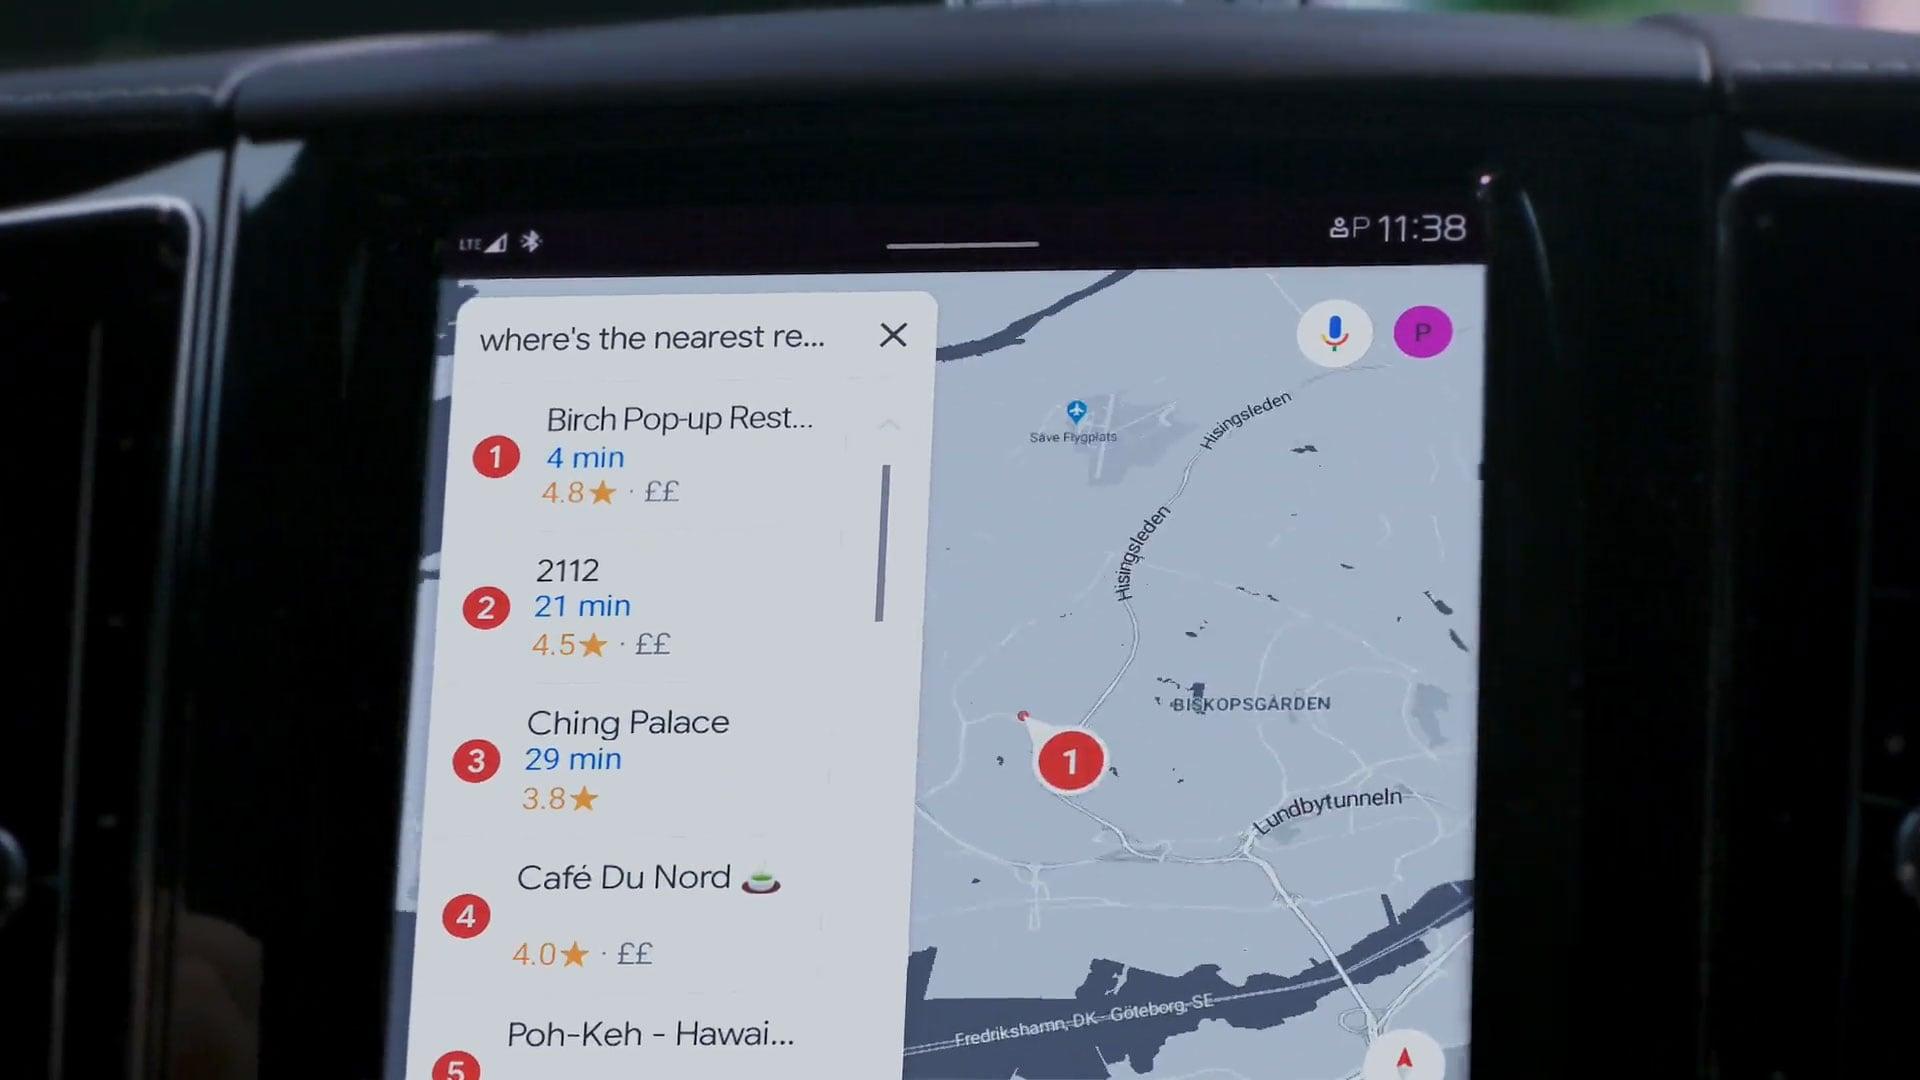 Google Maps πλήρως ενσωματωμένοι στο S90 Recharge.